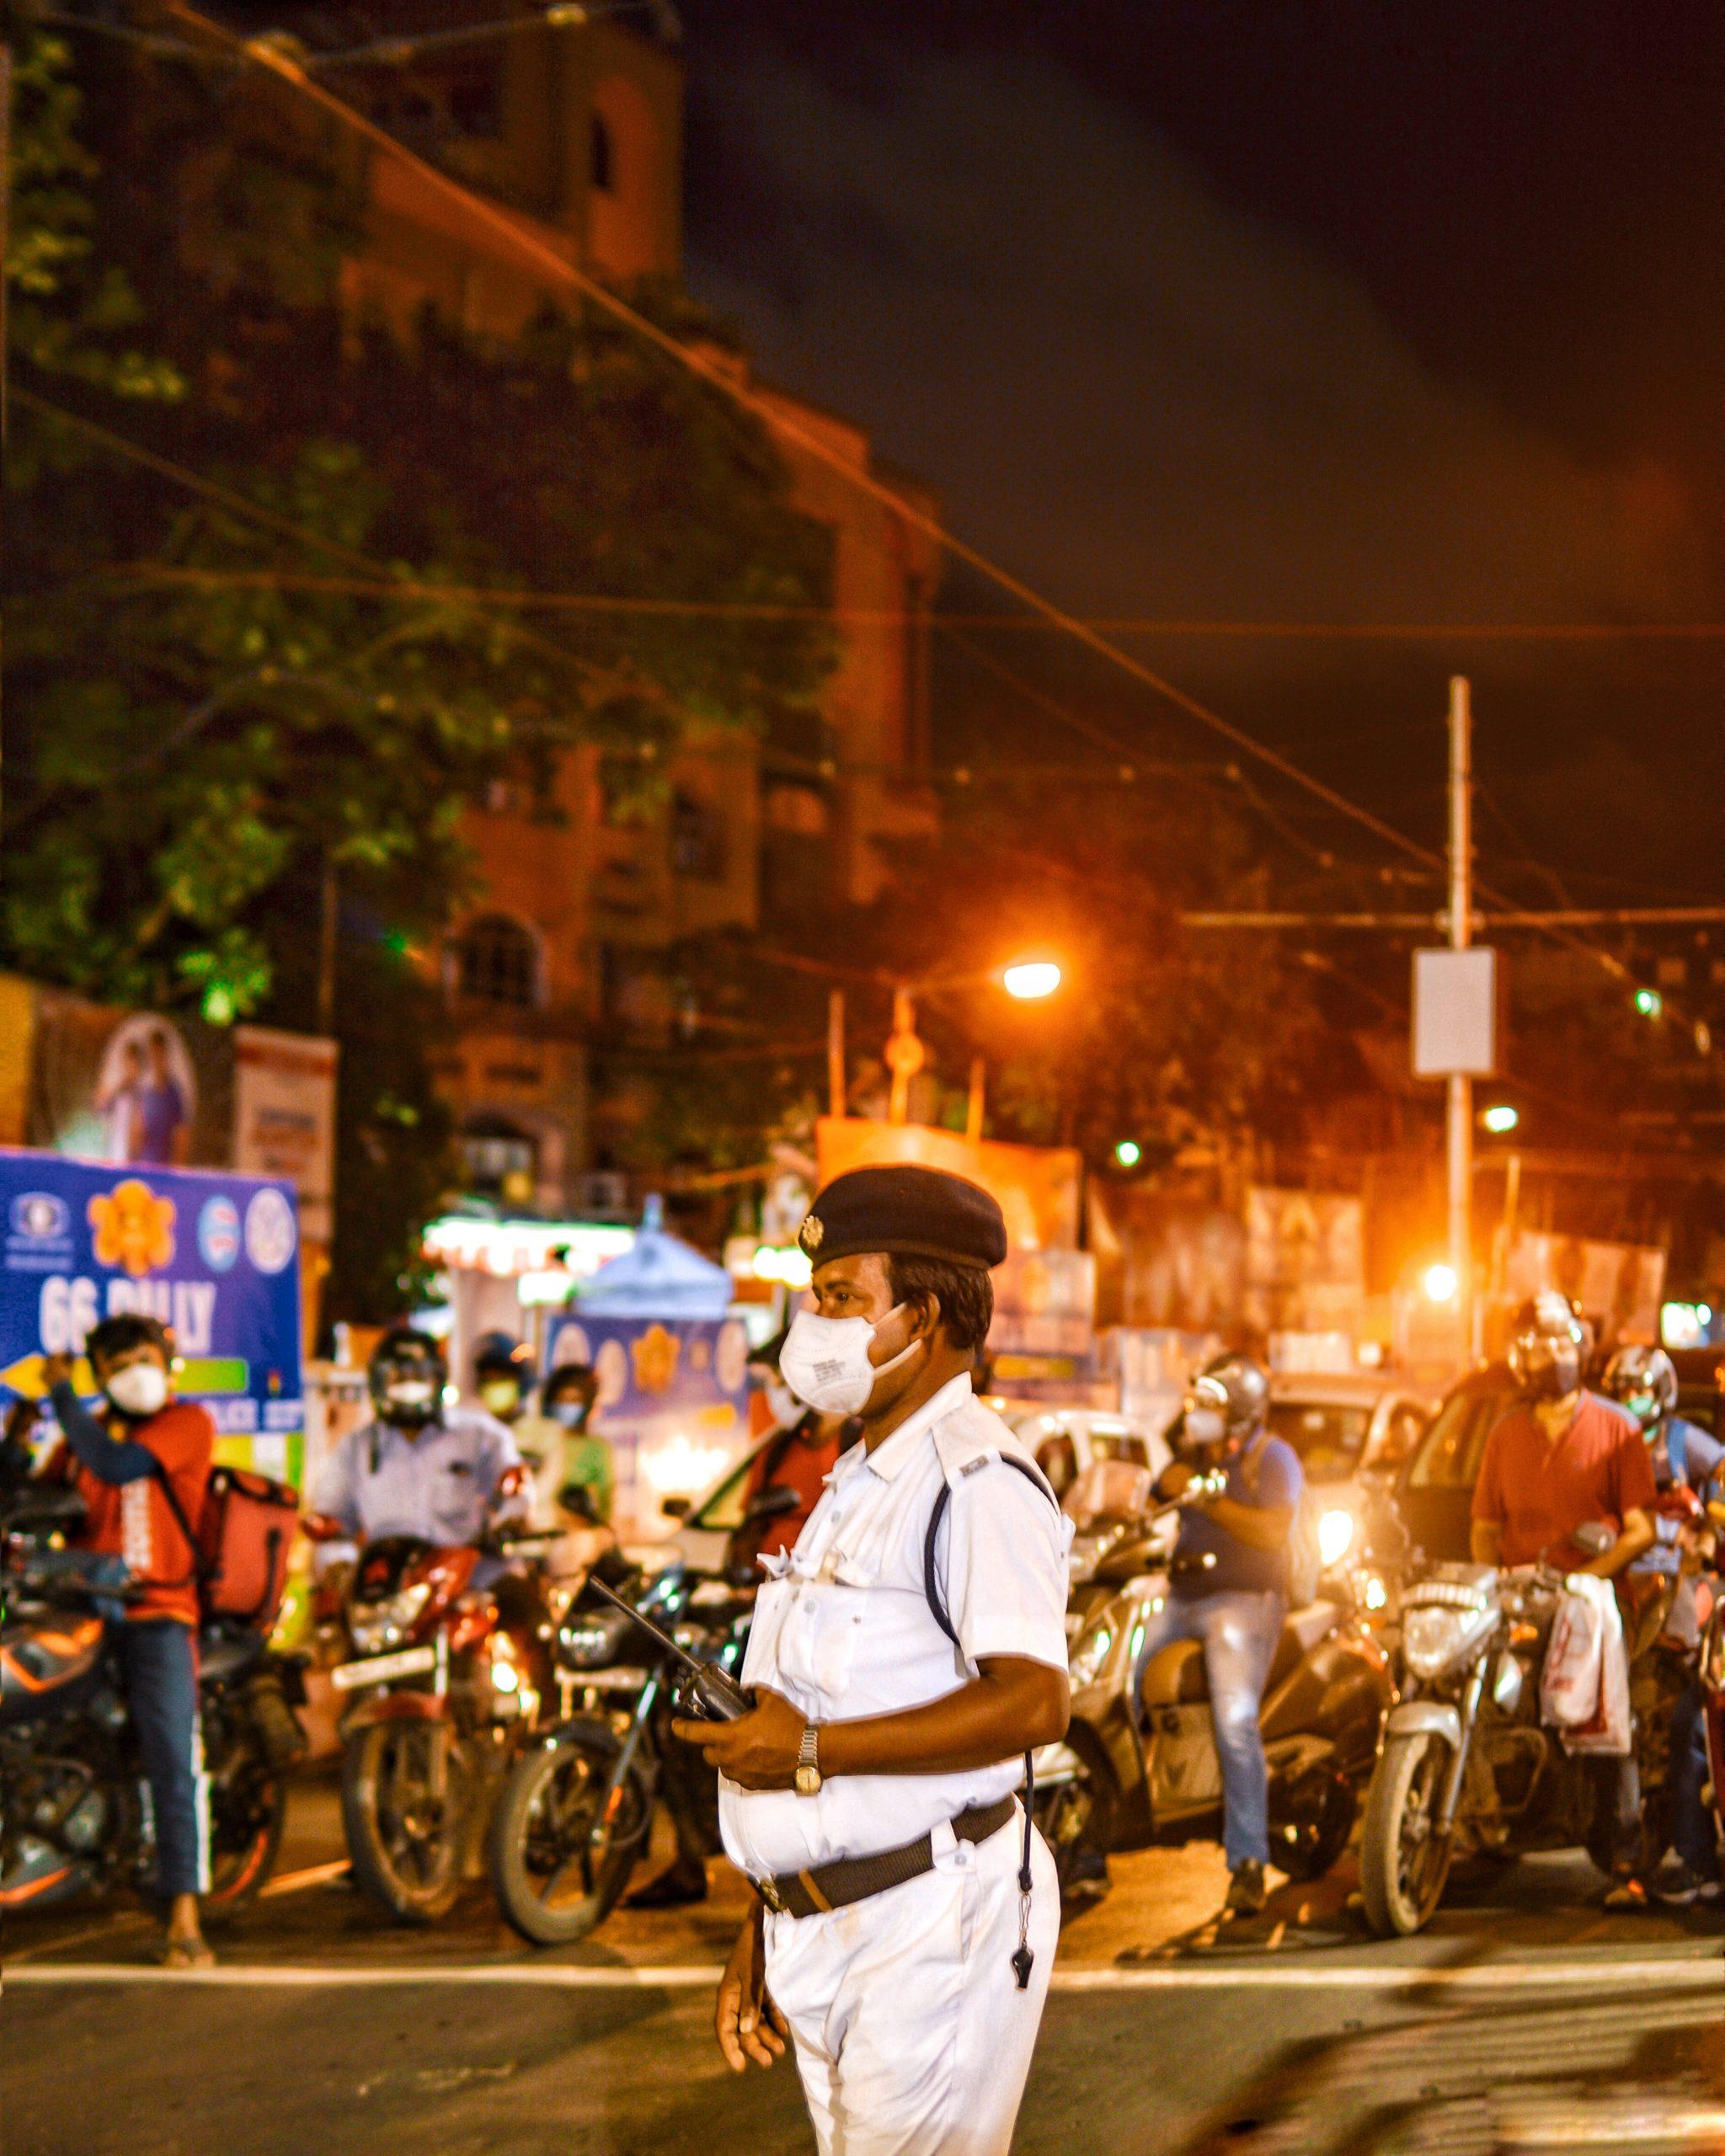 A policeman managing traffic